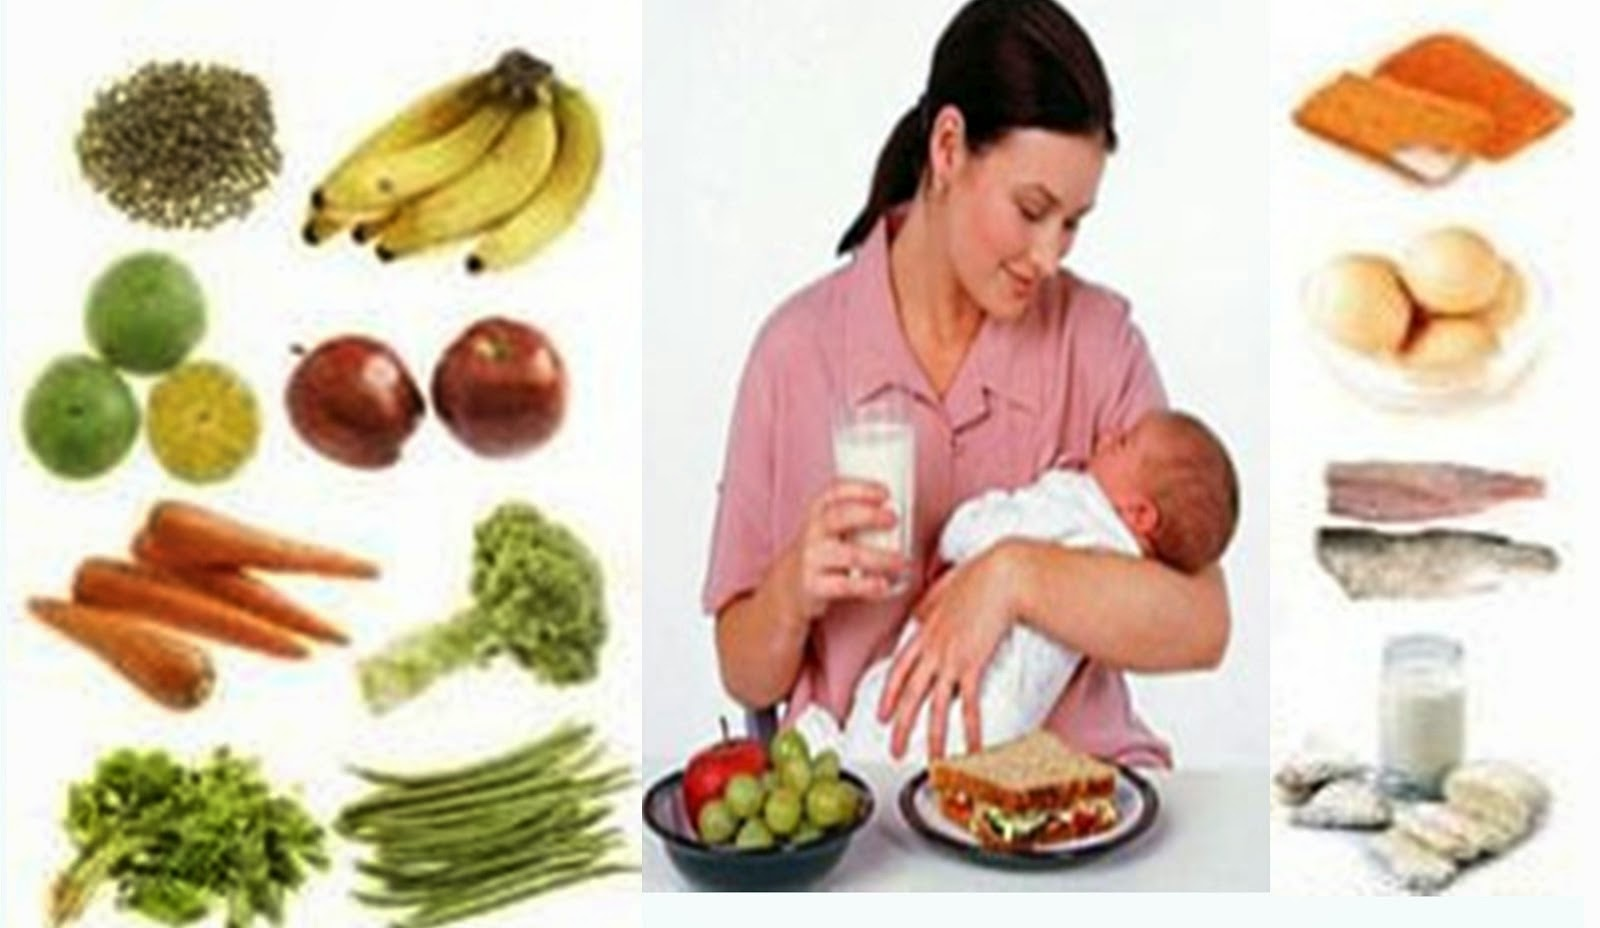 http://obatsesaknafasuntukibumenyusui.blogspot.com/2014/11/daftar-makanan-sehat-untuk-ibu-menyusui.html